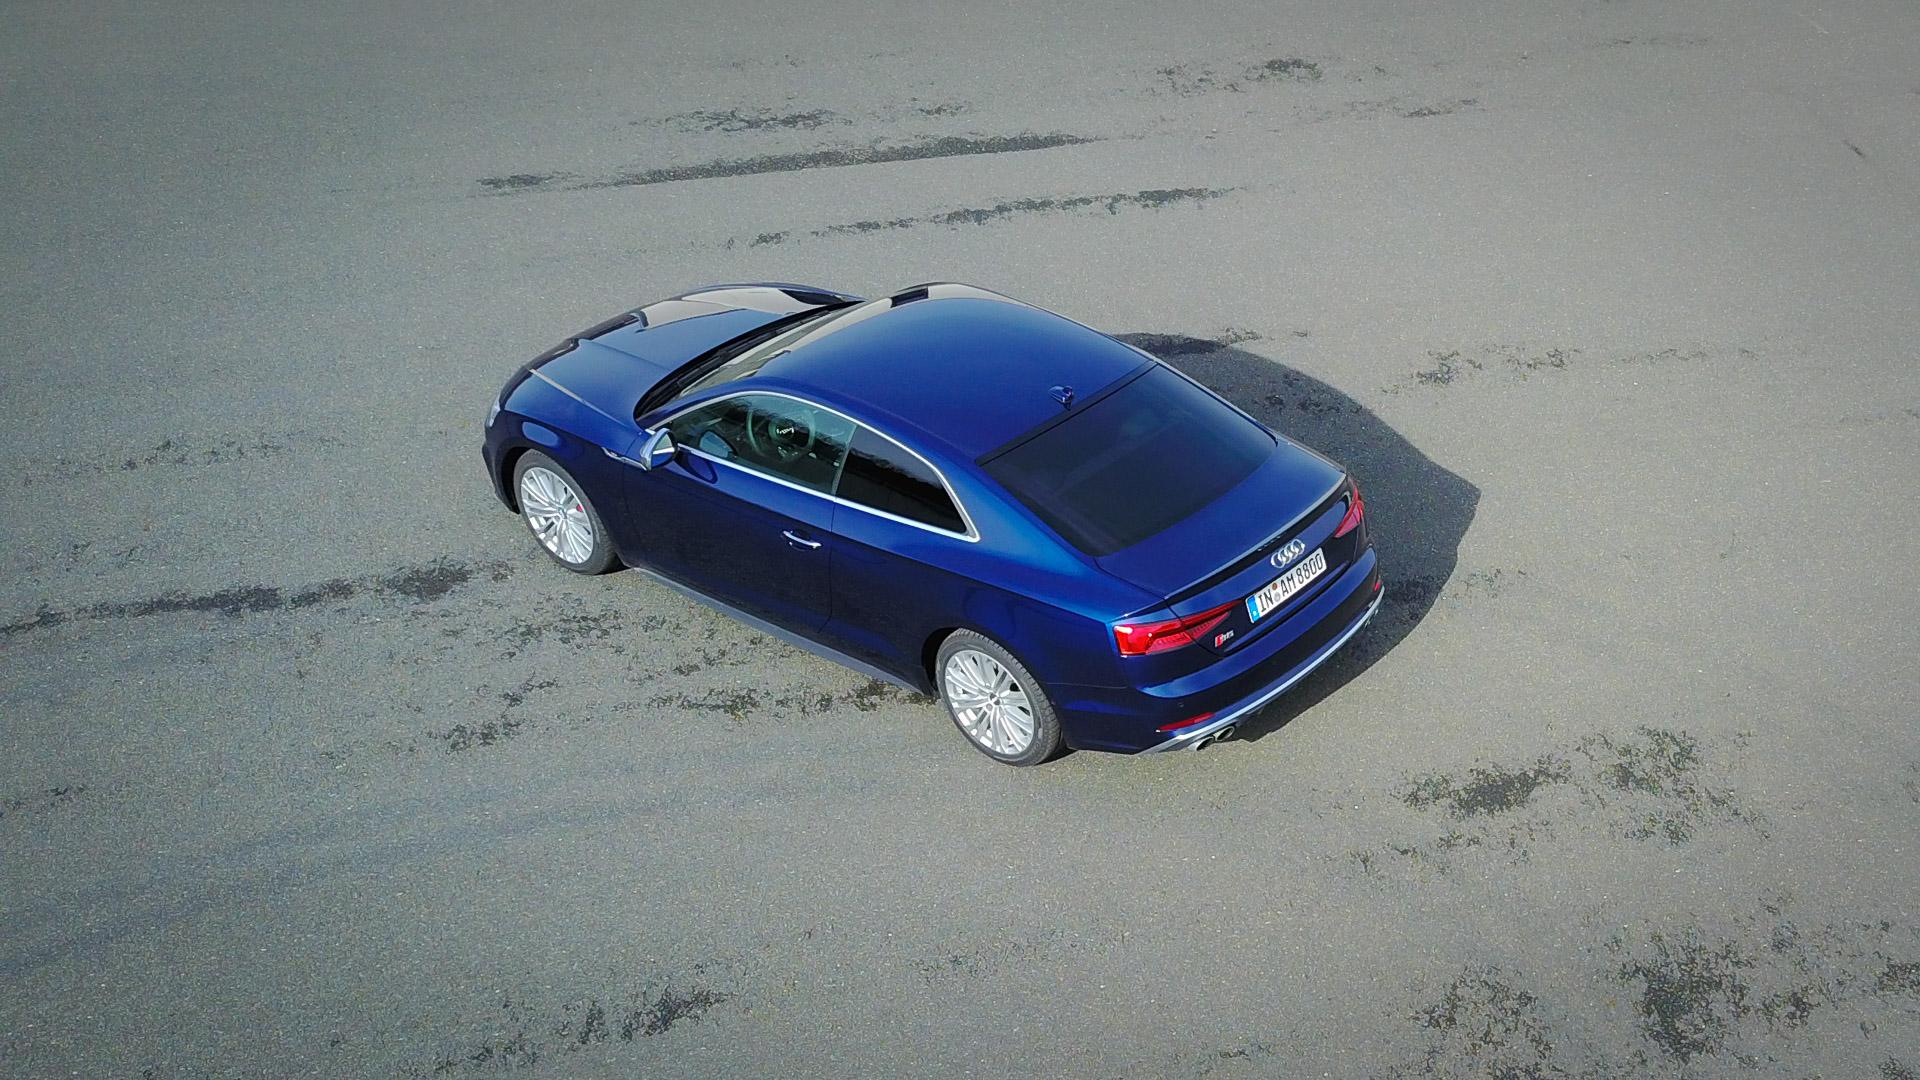 Fotos 2017 Audi A5 Coupé (F5) Navarrablau Metallic ...